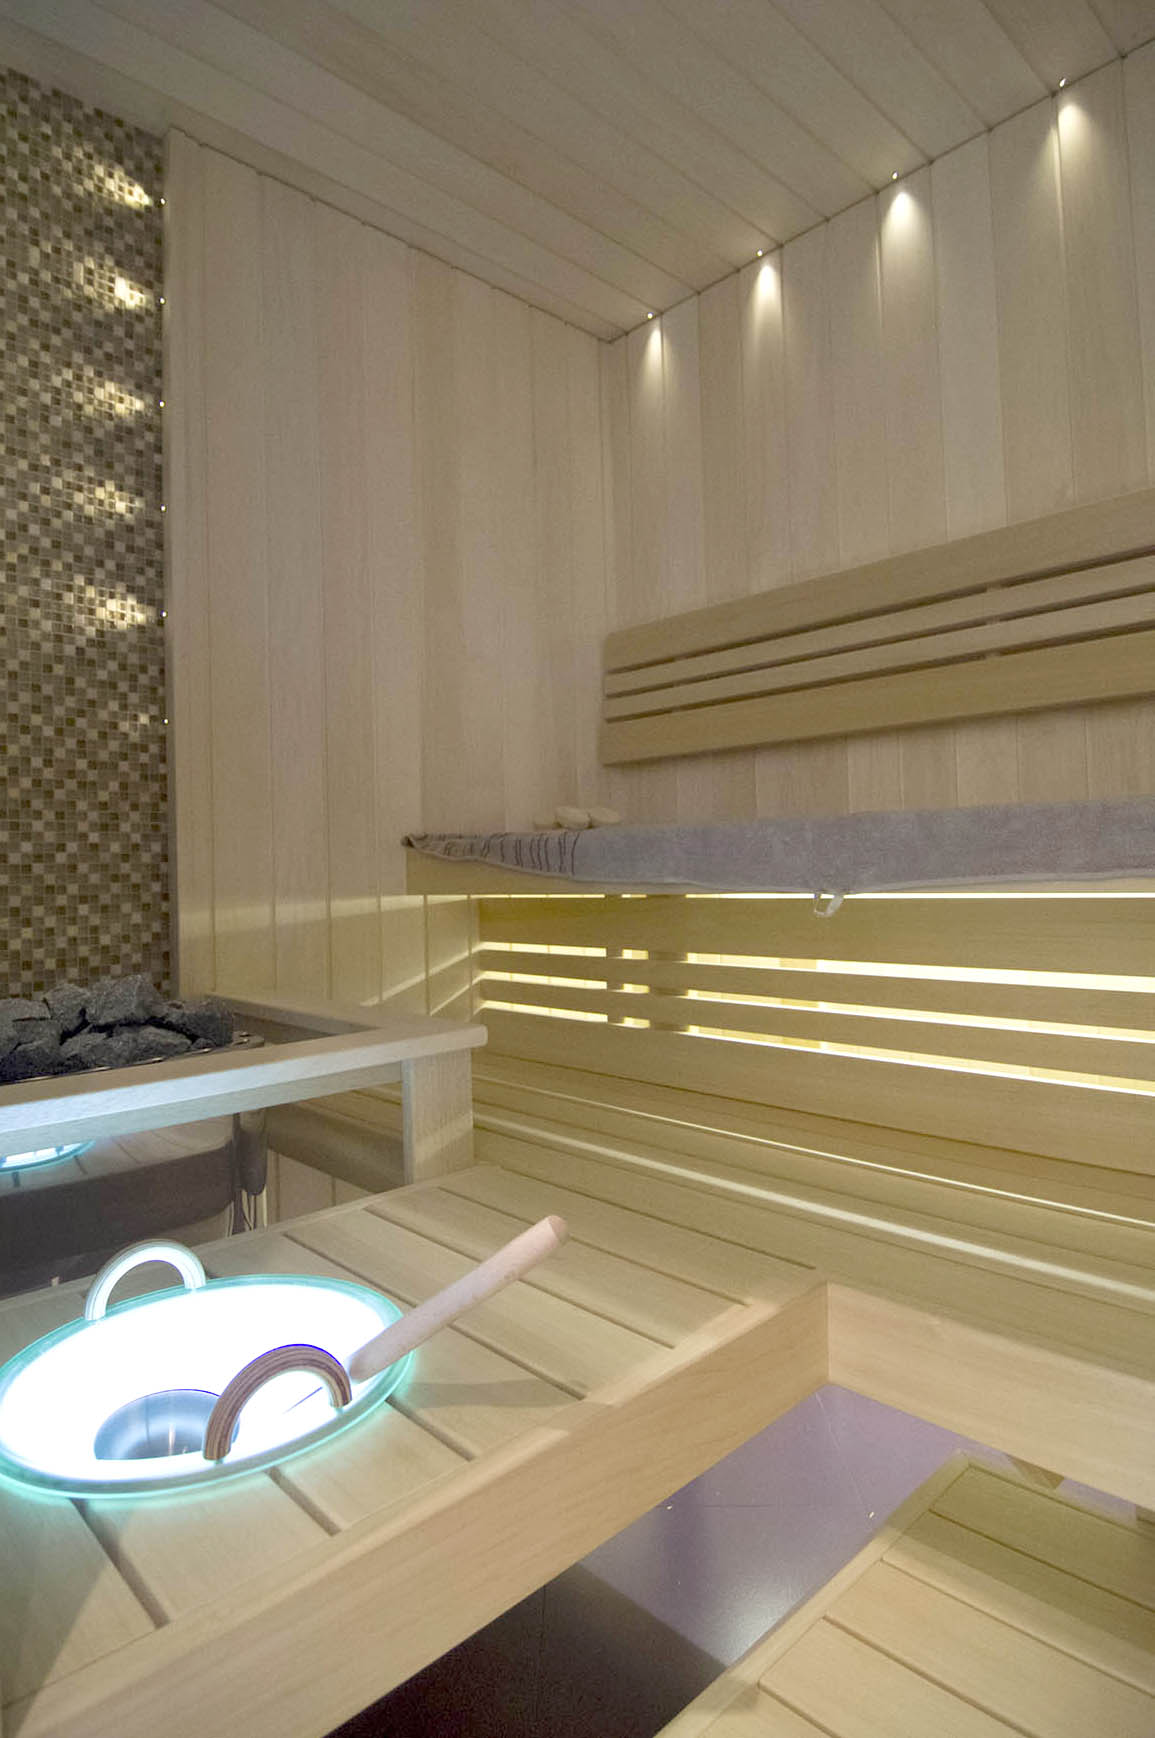 IMGP0416---finnish-sauna-steam-hamam-bath-russian-sauna-heaters-saunainter-com-saunamaailm